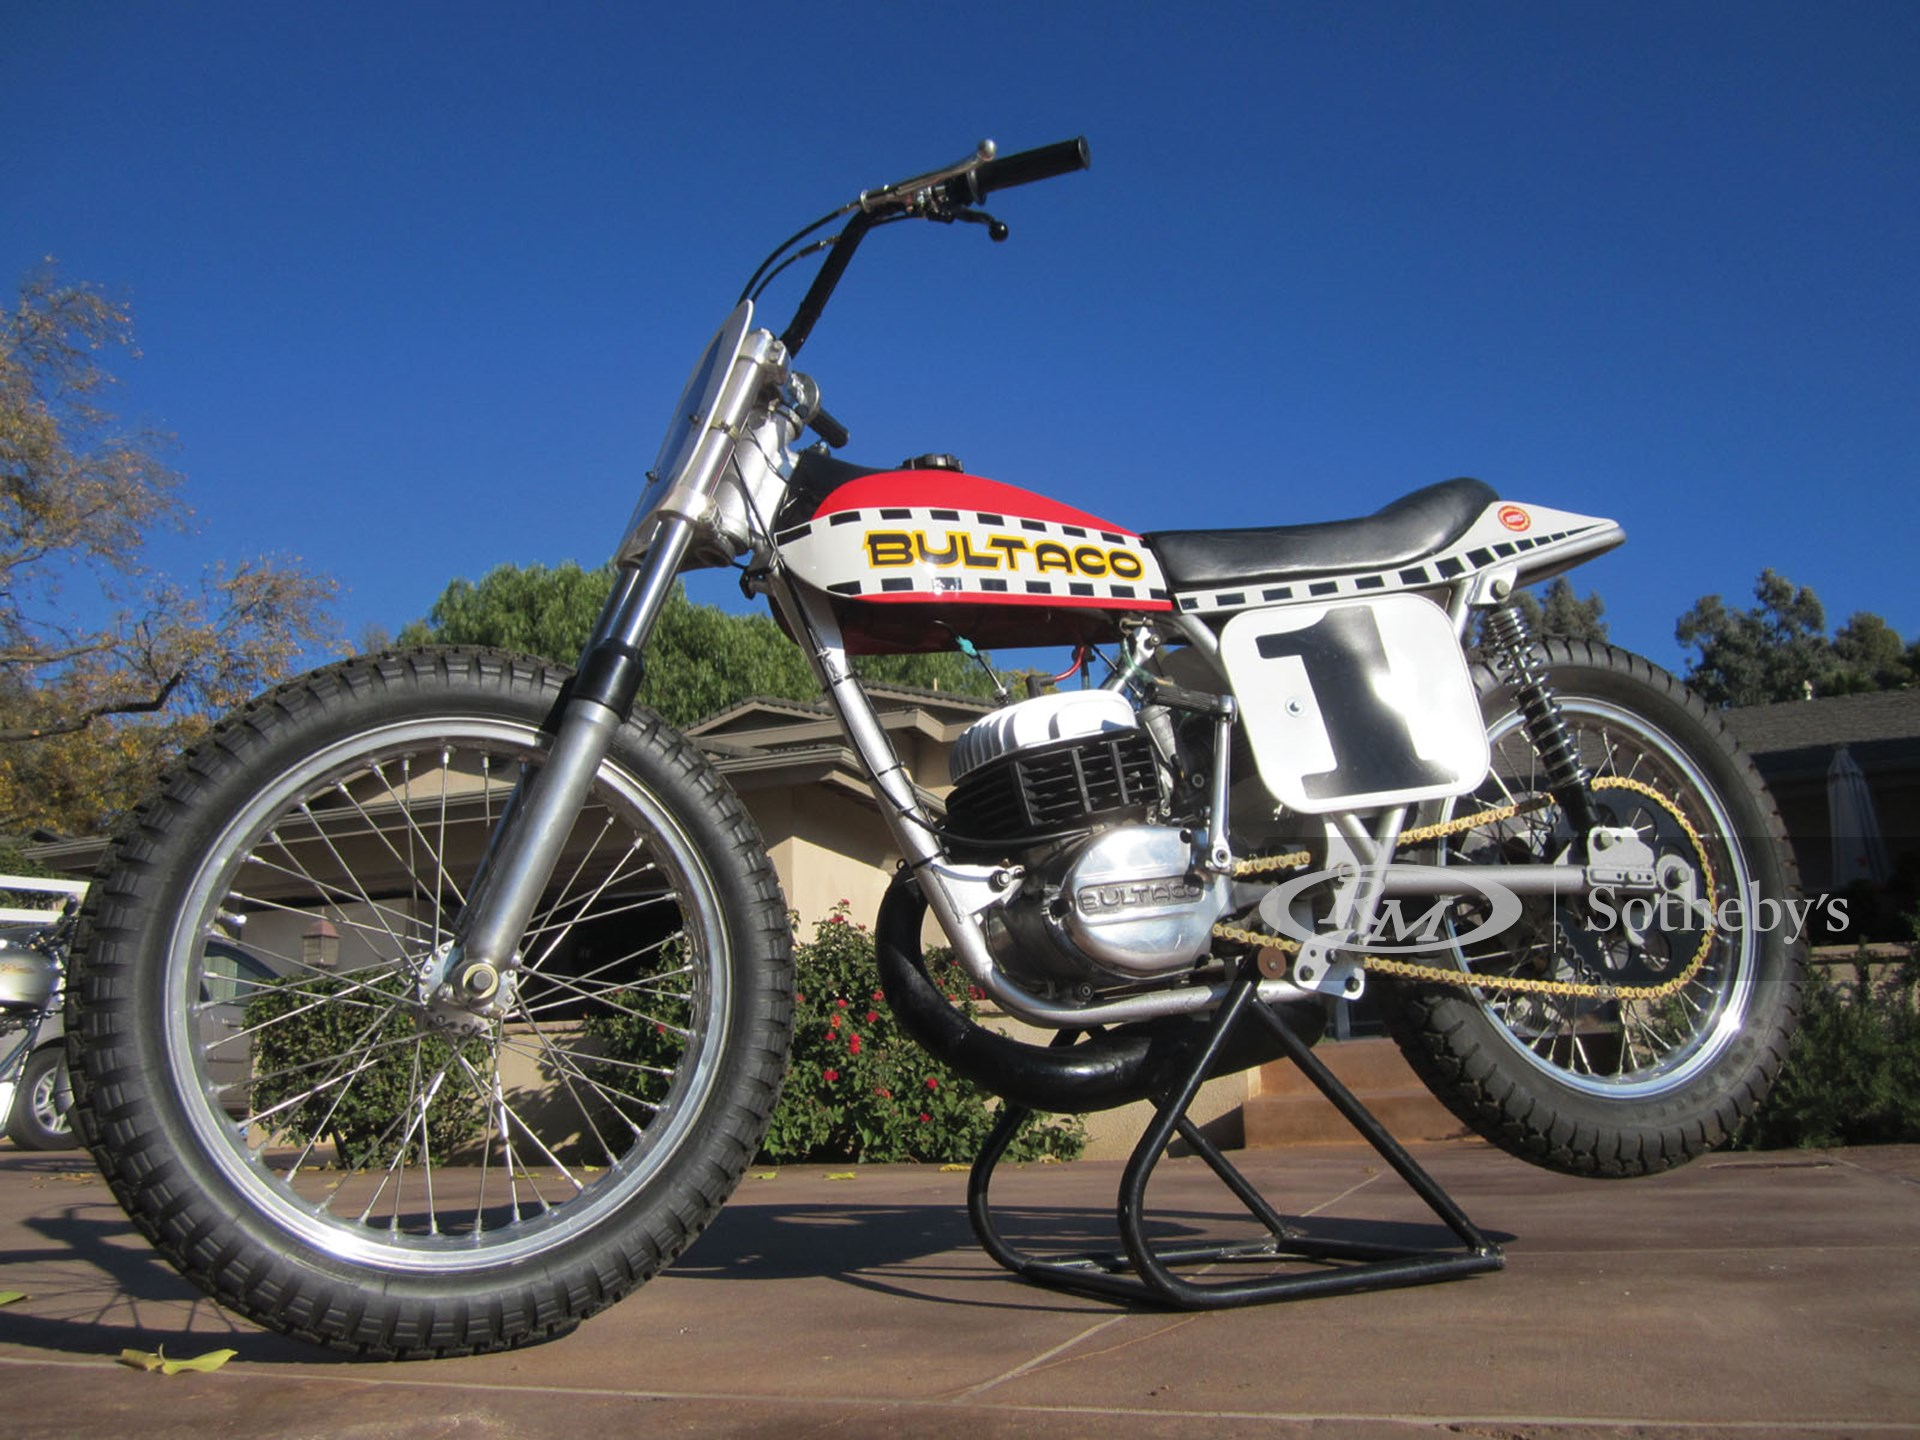 1976 Bultaco Astro